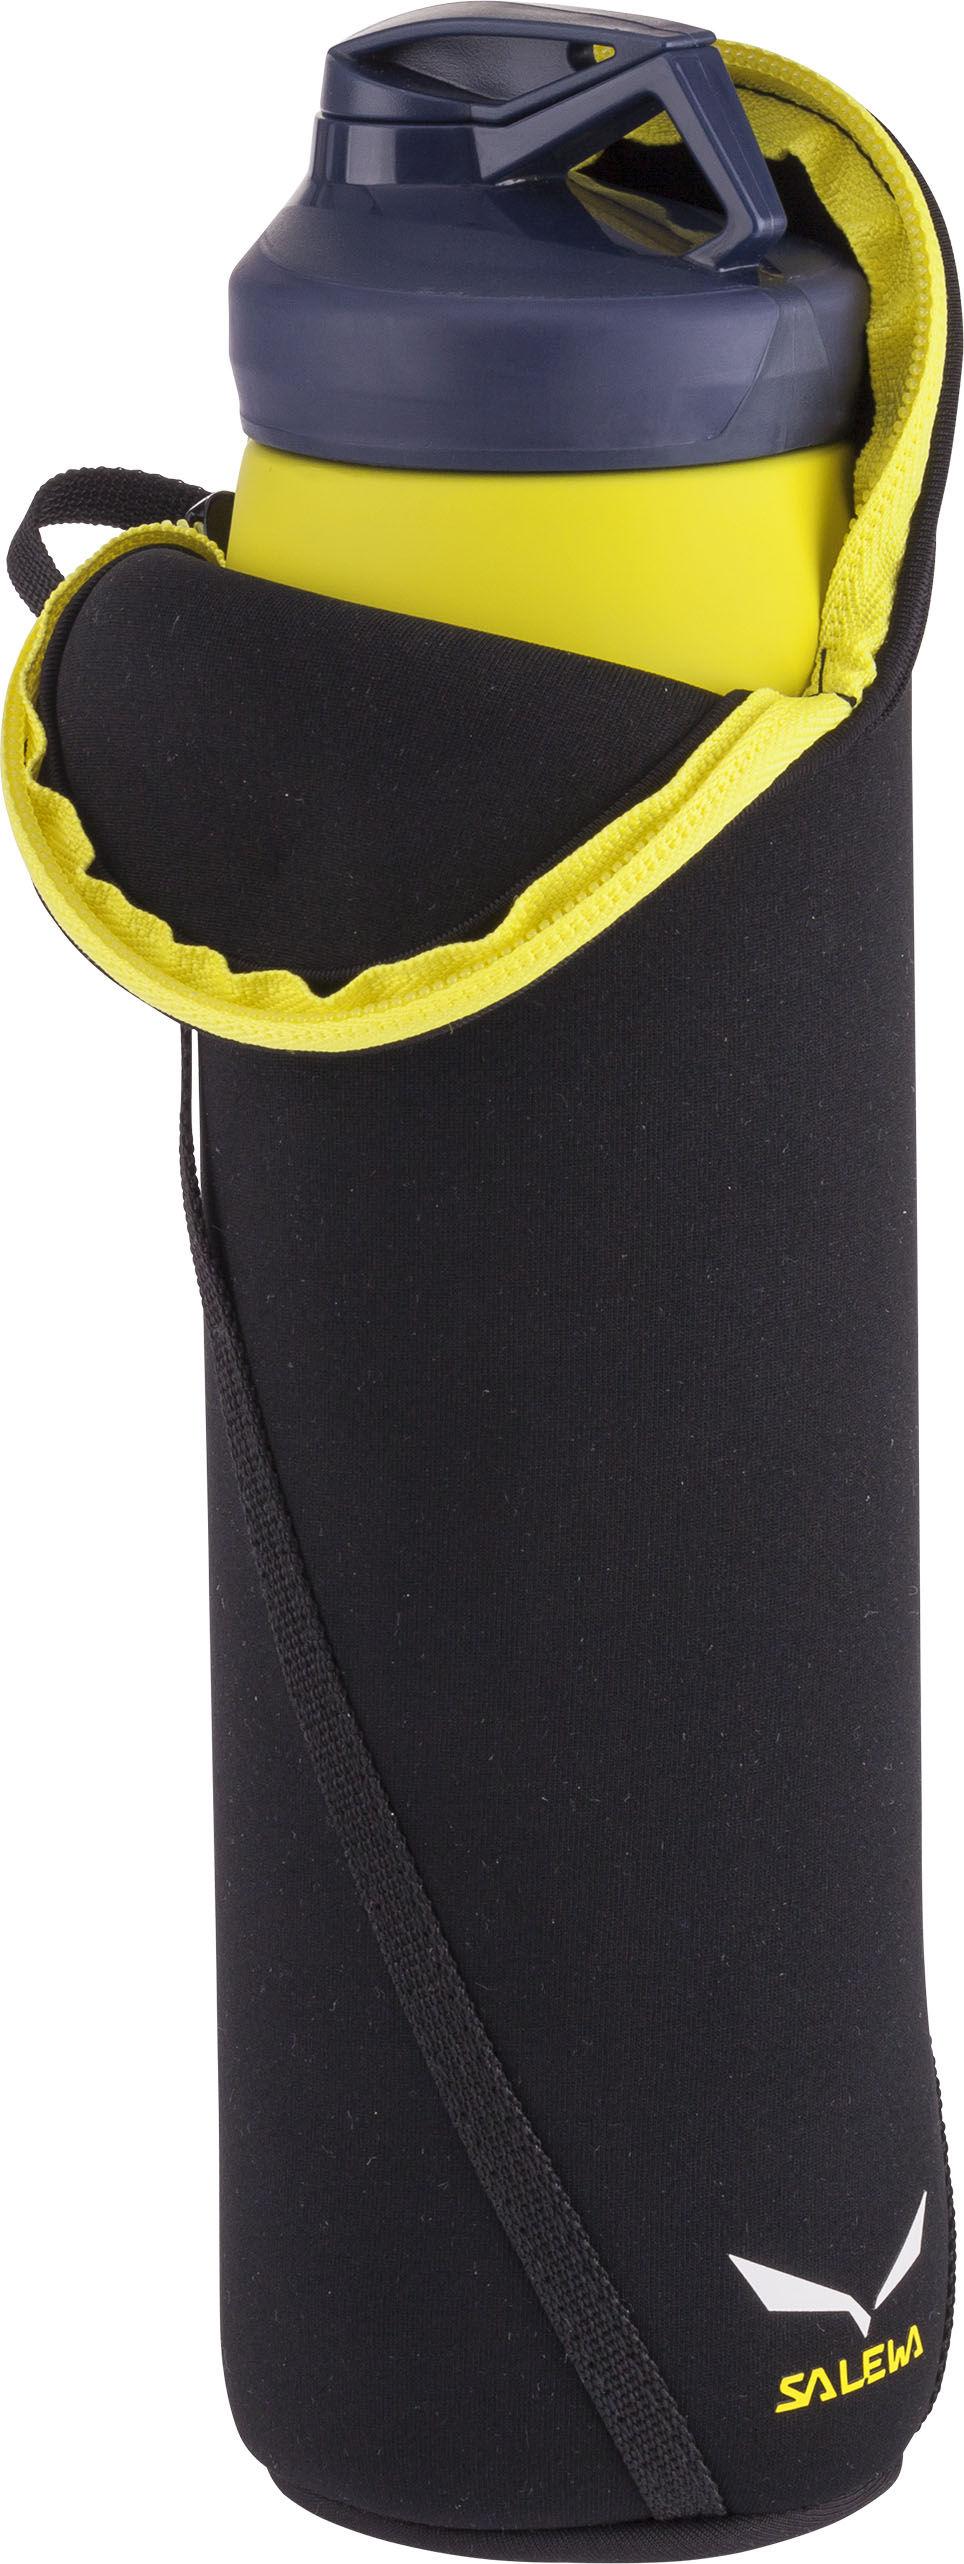 Ізоляційний чохол Salewa Insulation Cover 0,5 л